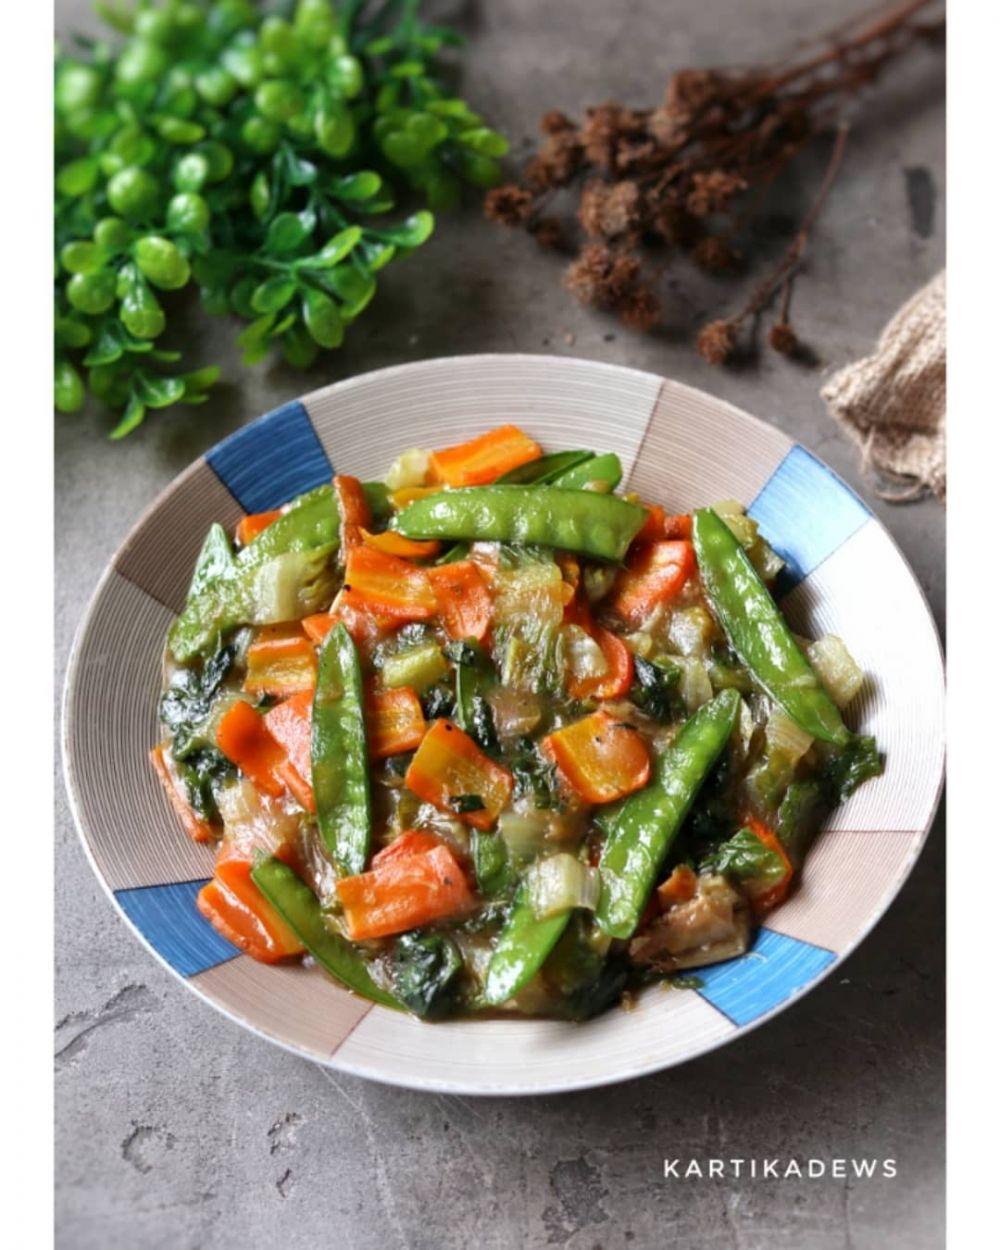 resep tumis sayur tiram © Instagram